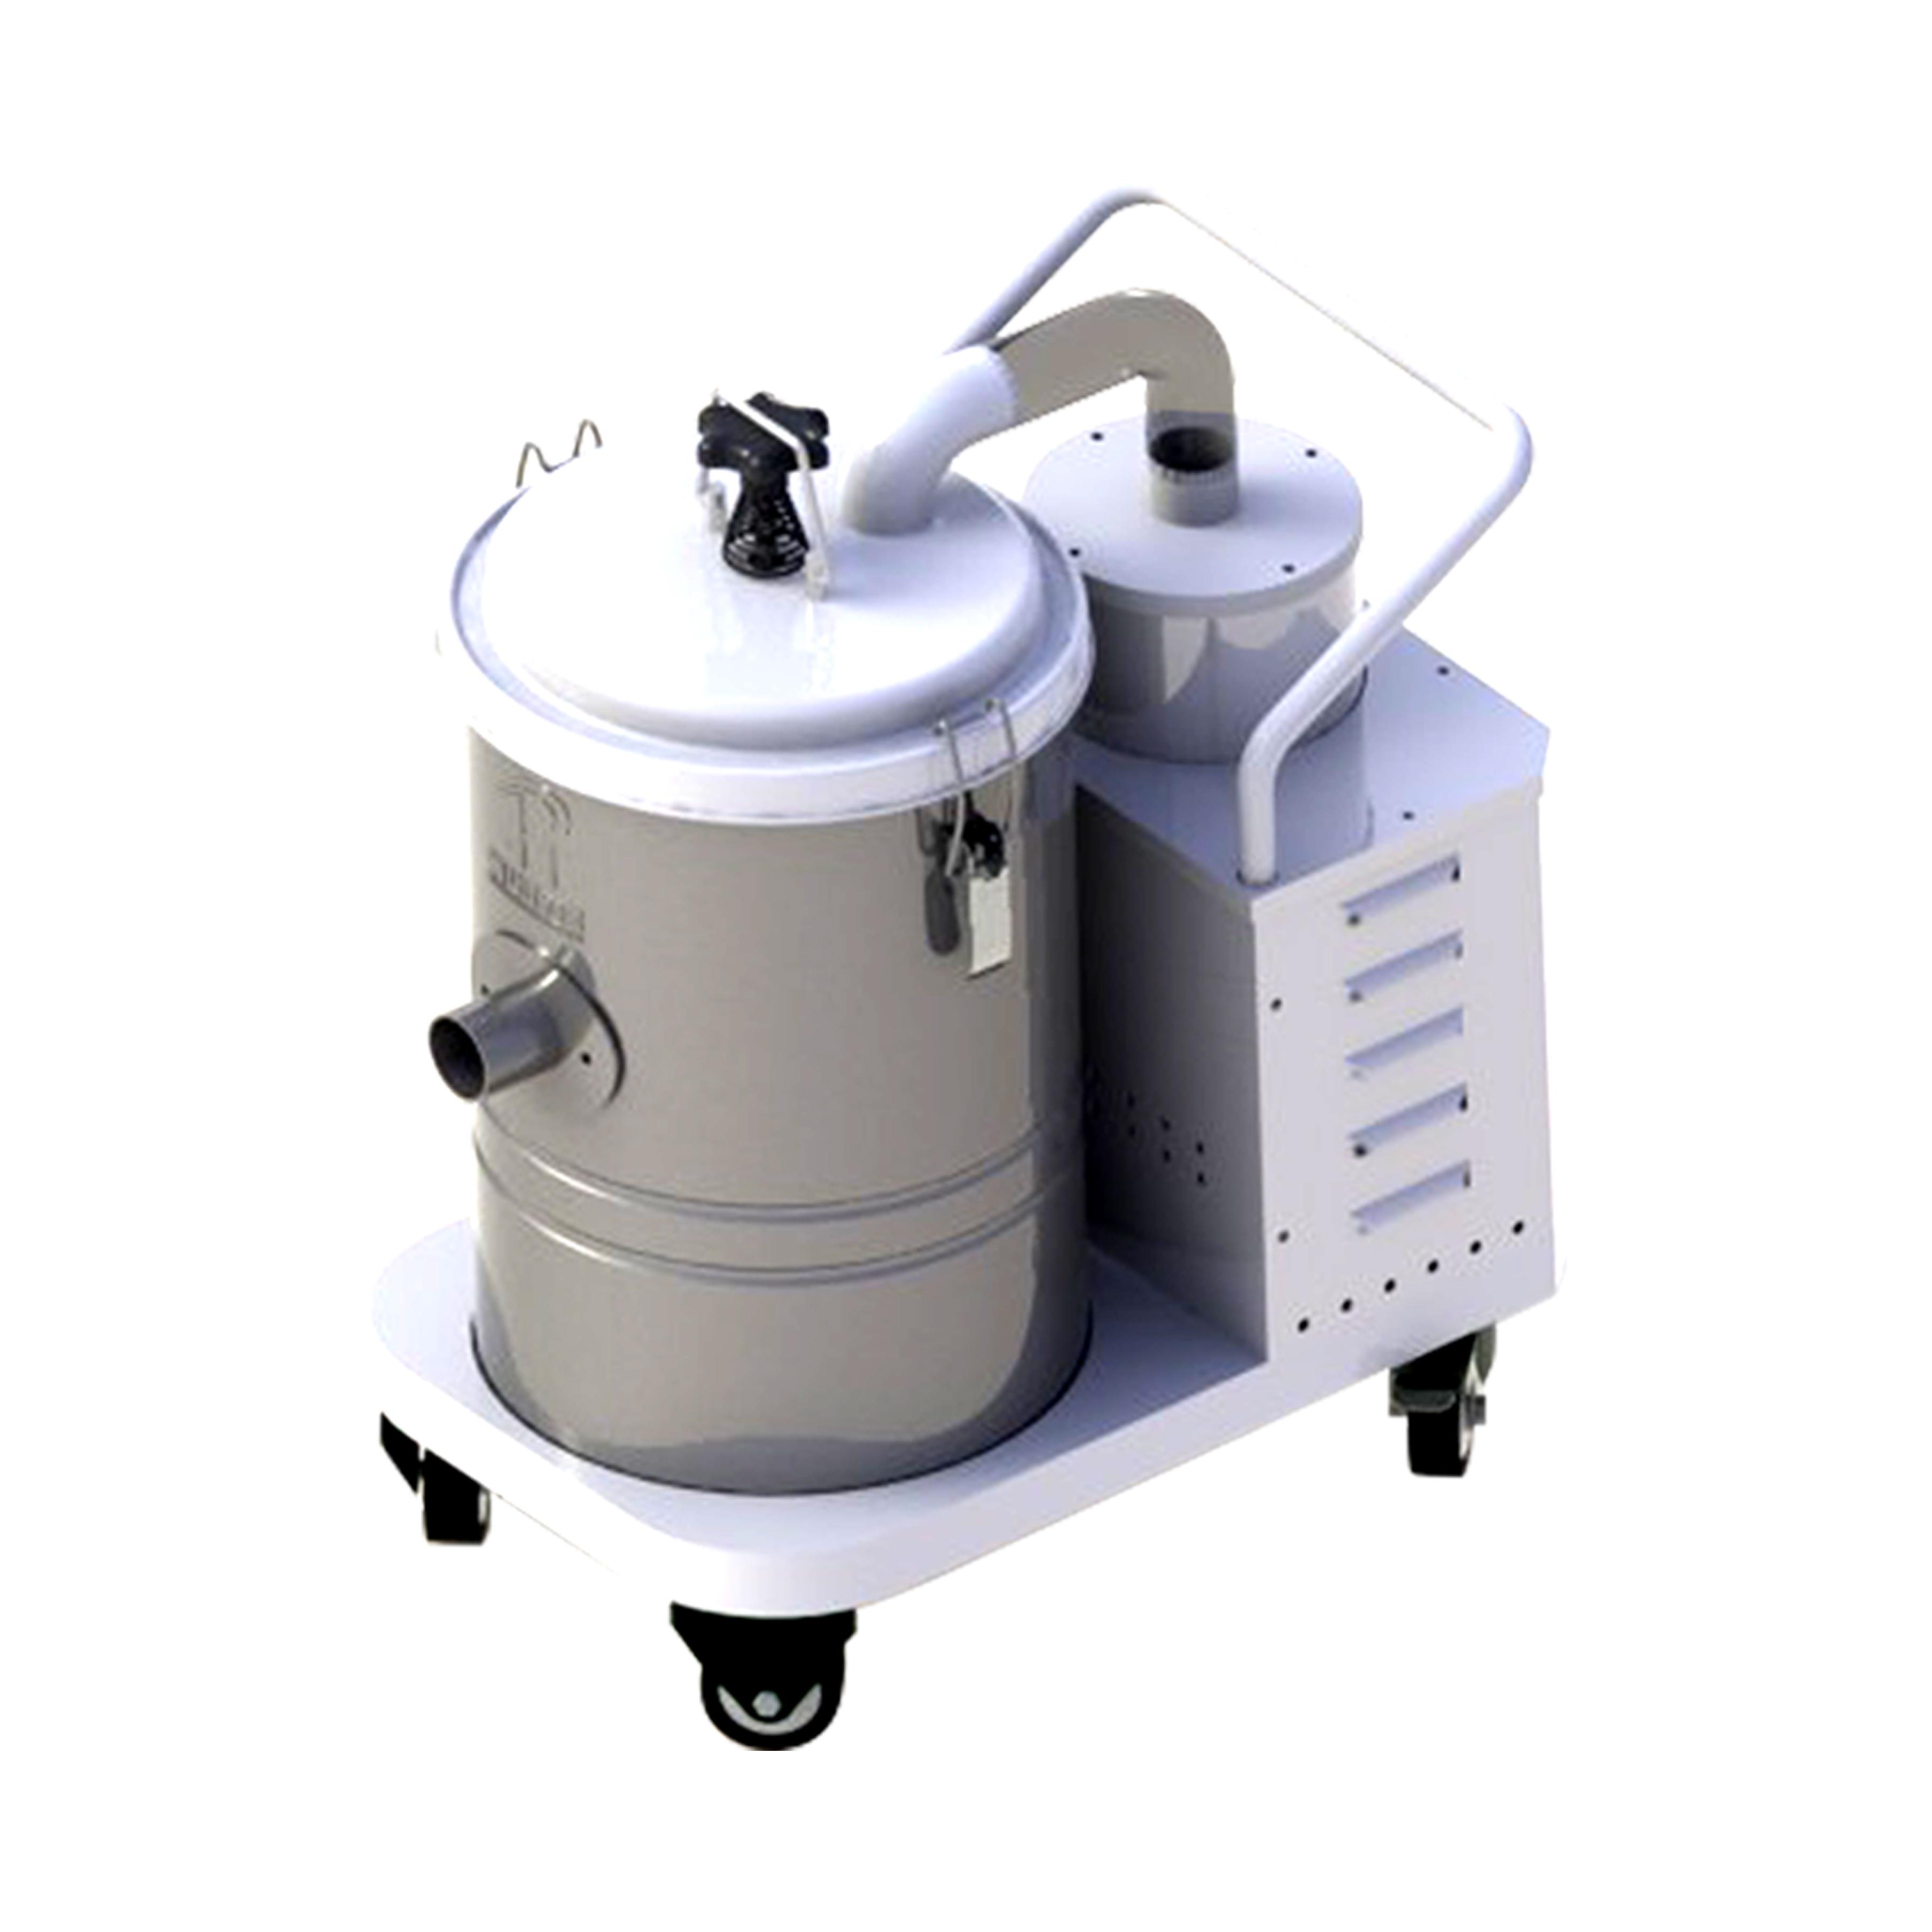 MS30 industrial vacuum cleaner